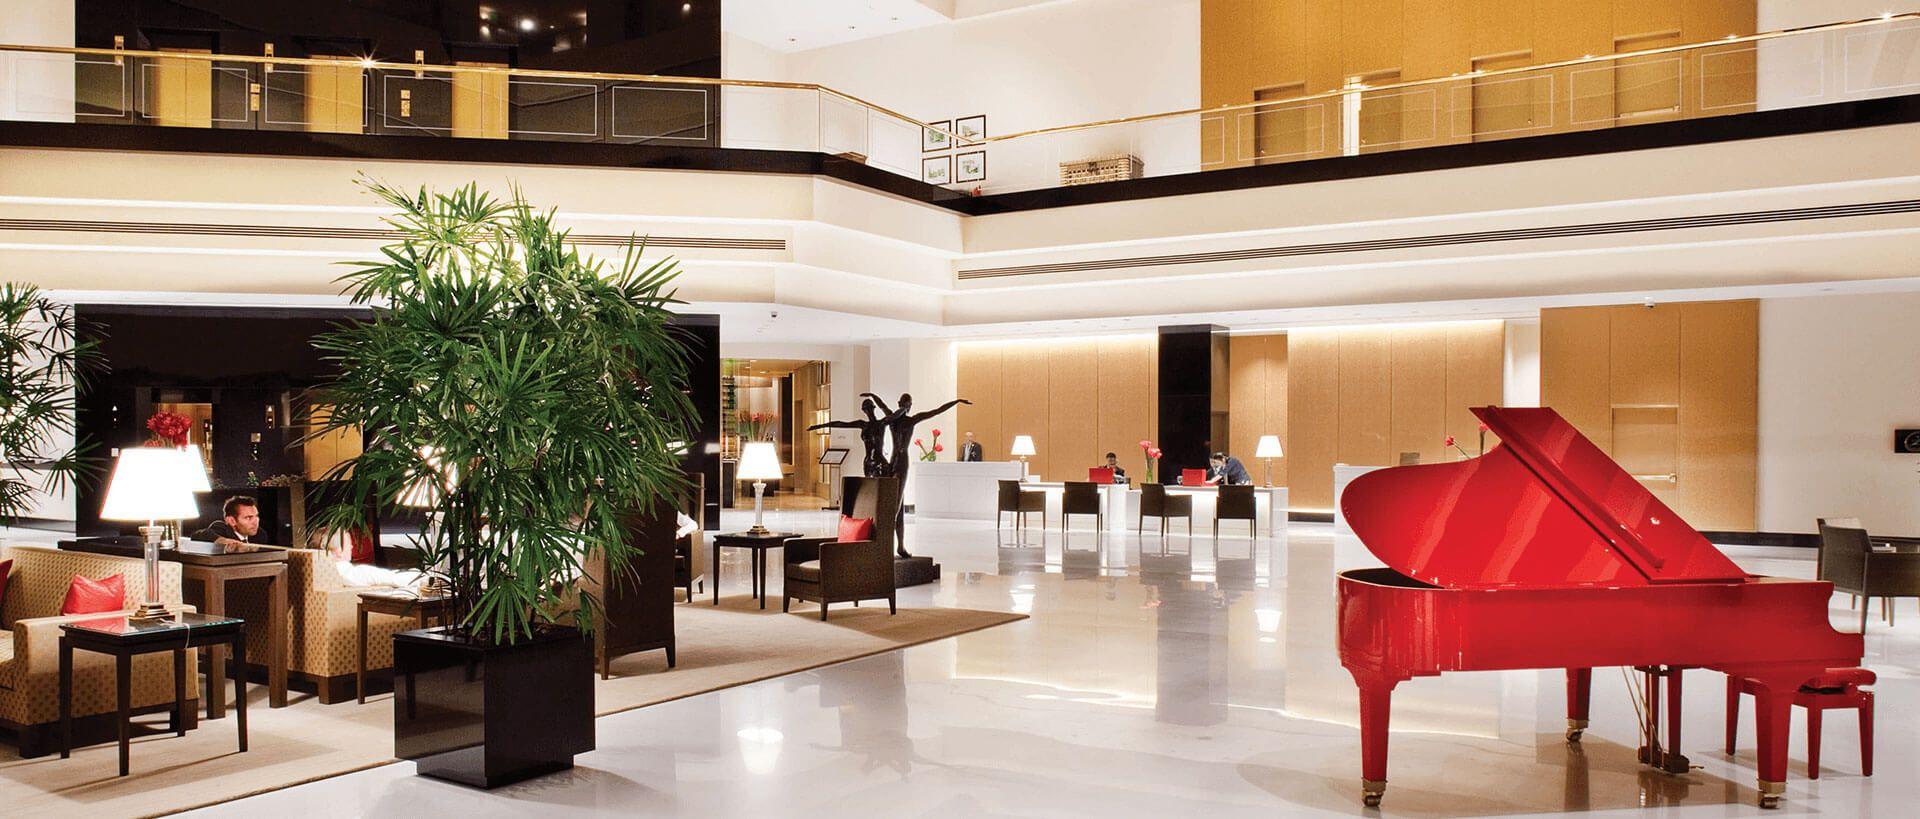 5 Star Hotels In Mumbai Best Hotels In South Mumbai The